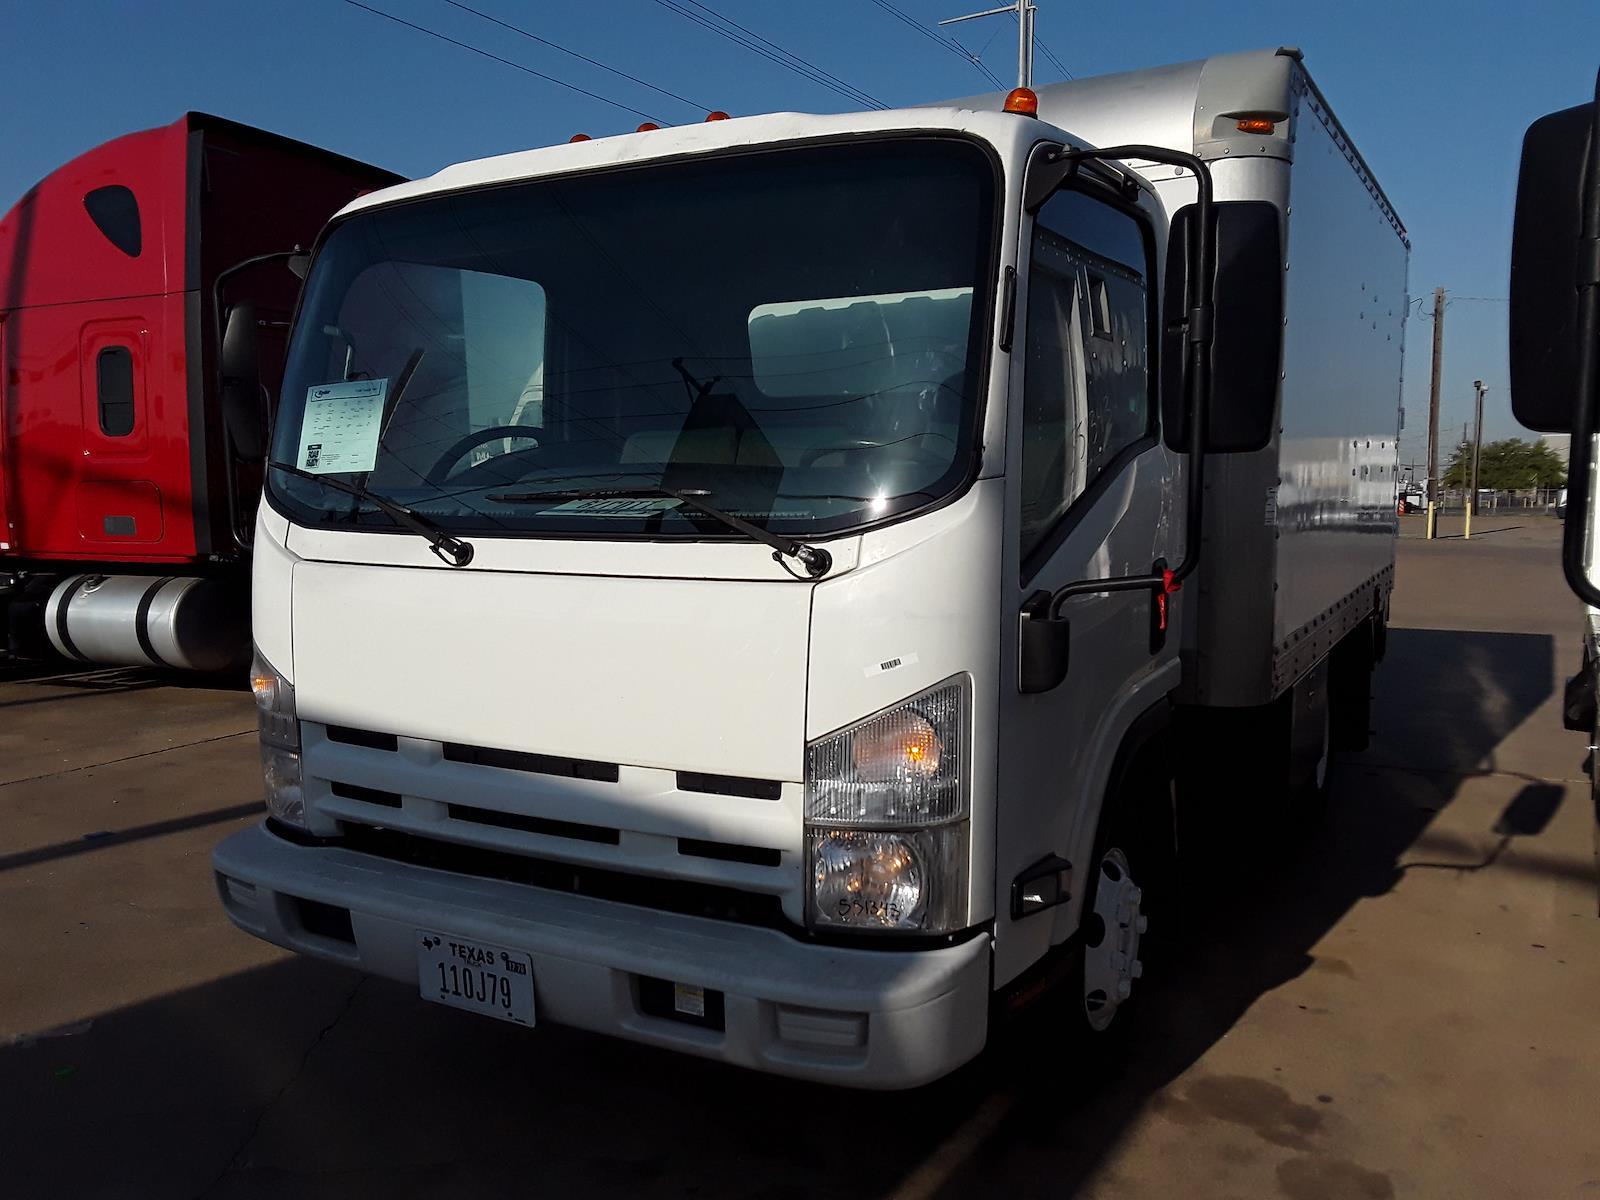 2014 Isuzu NPR Regular Cab 4x2, Dry Freight #551343 - photo 1